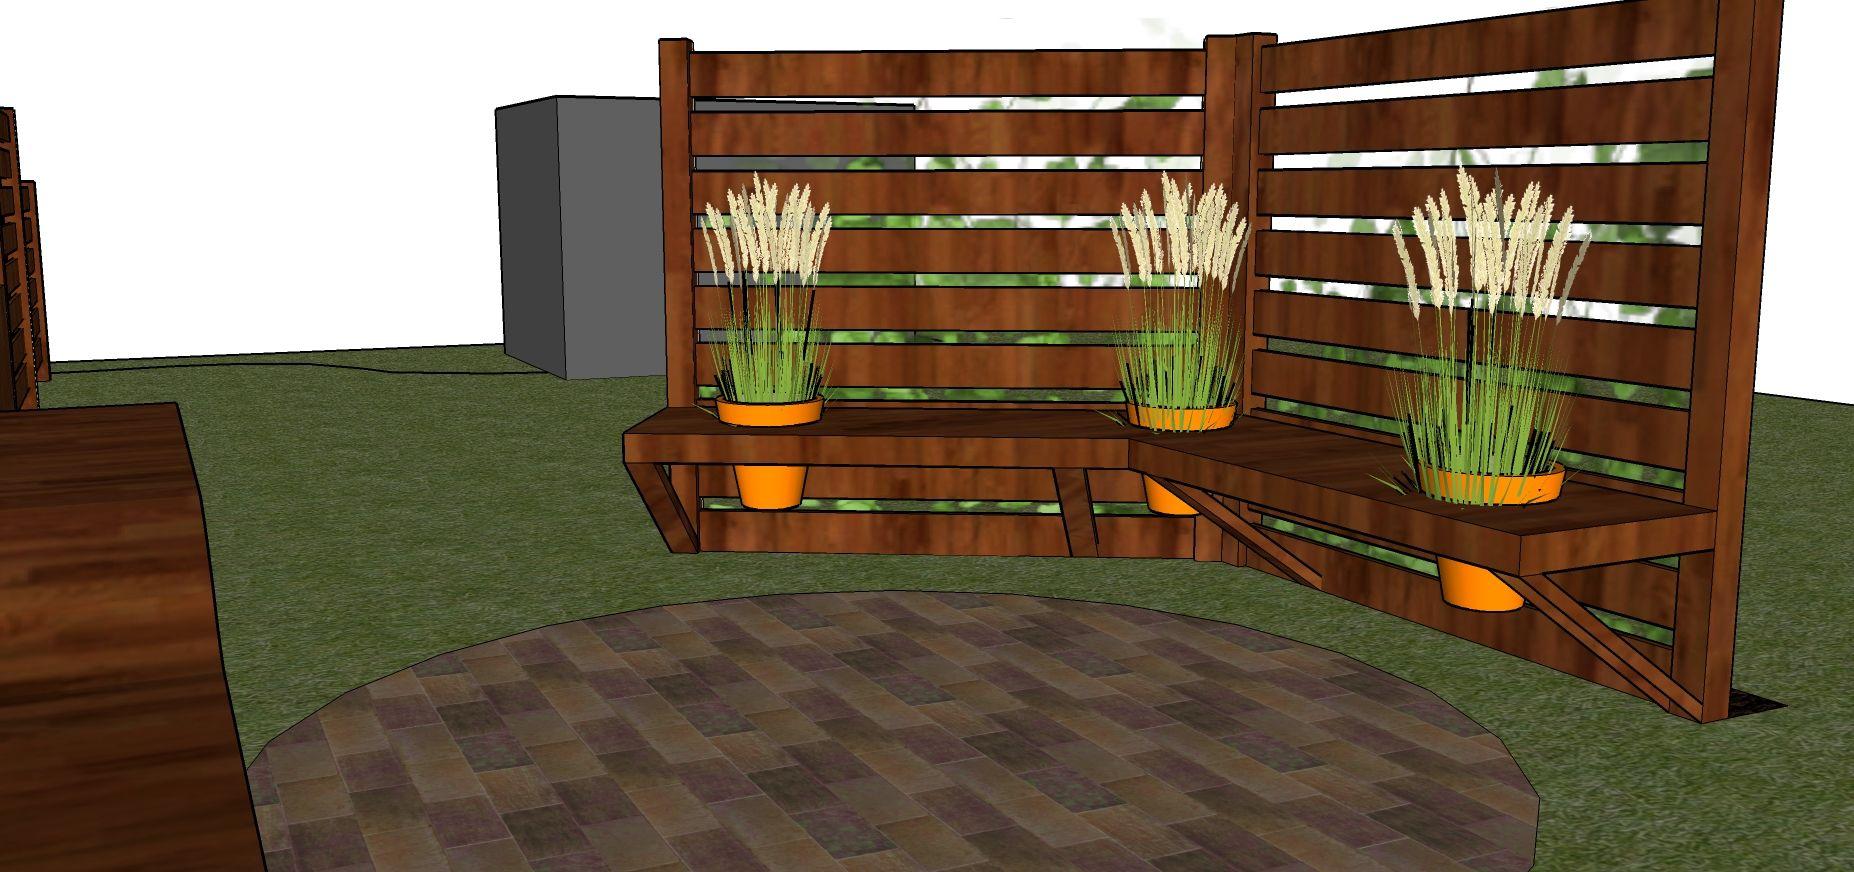 cran visuel par terralpha am nagement ext rieur. Black Bedroom Furniture Sets. Home Design Ideas